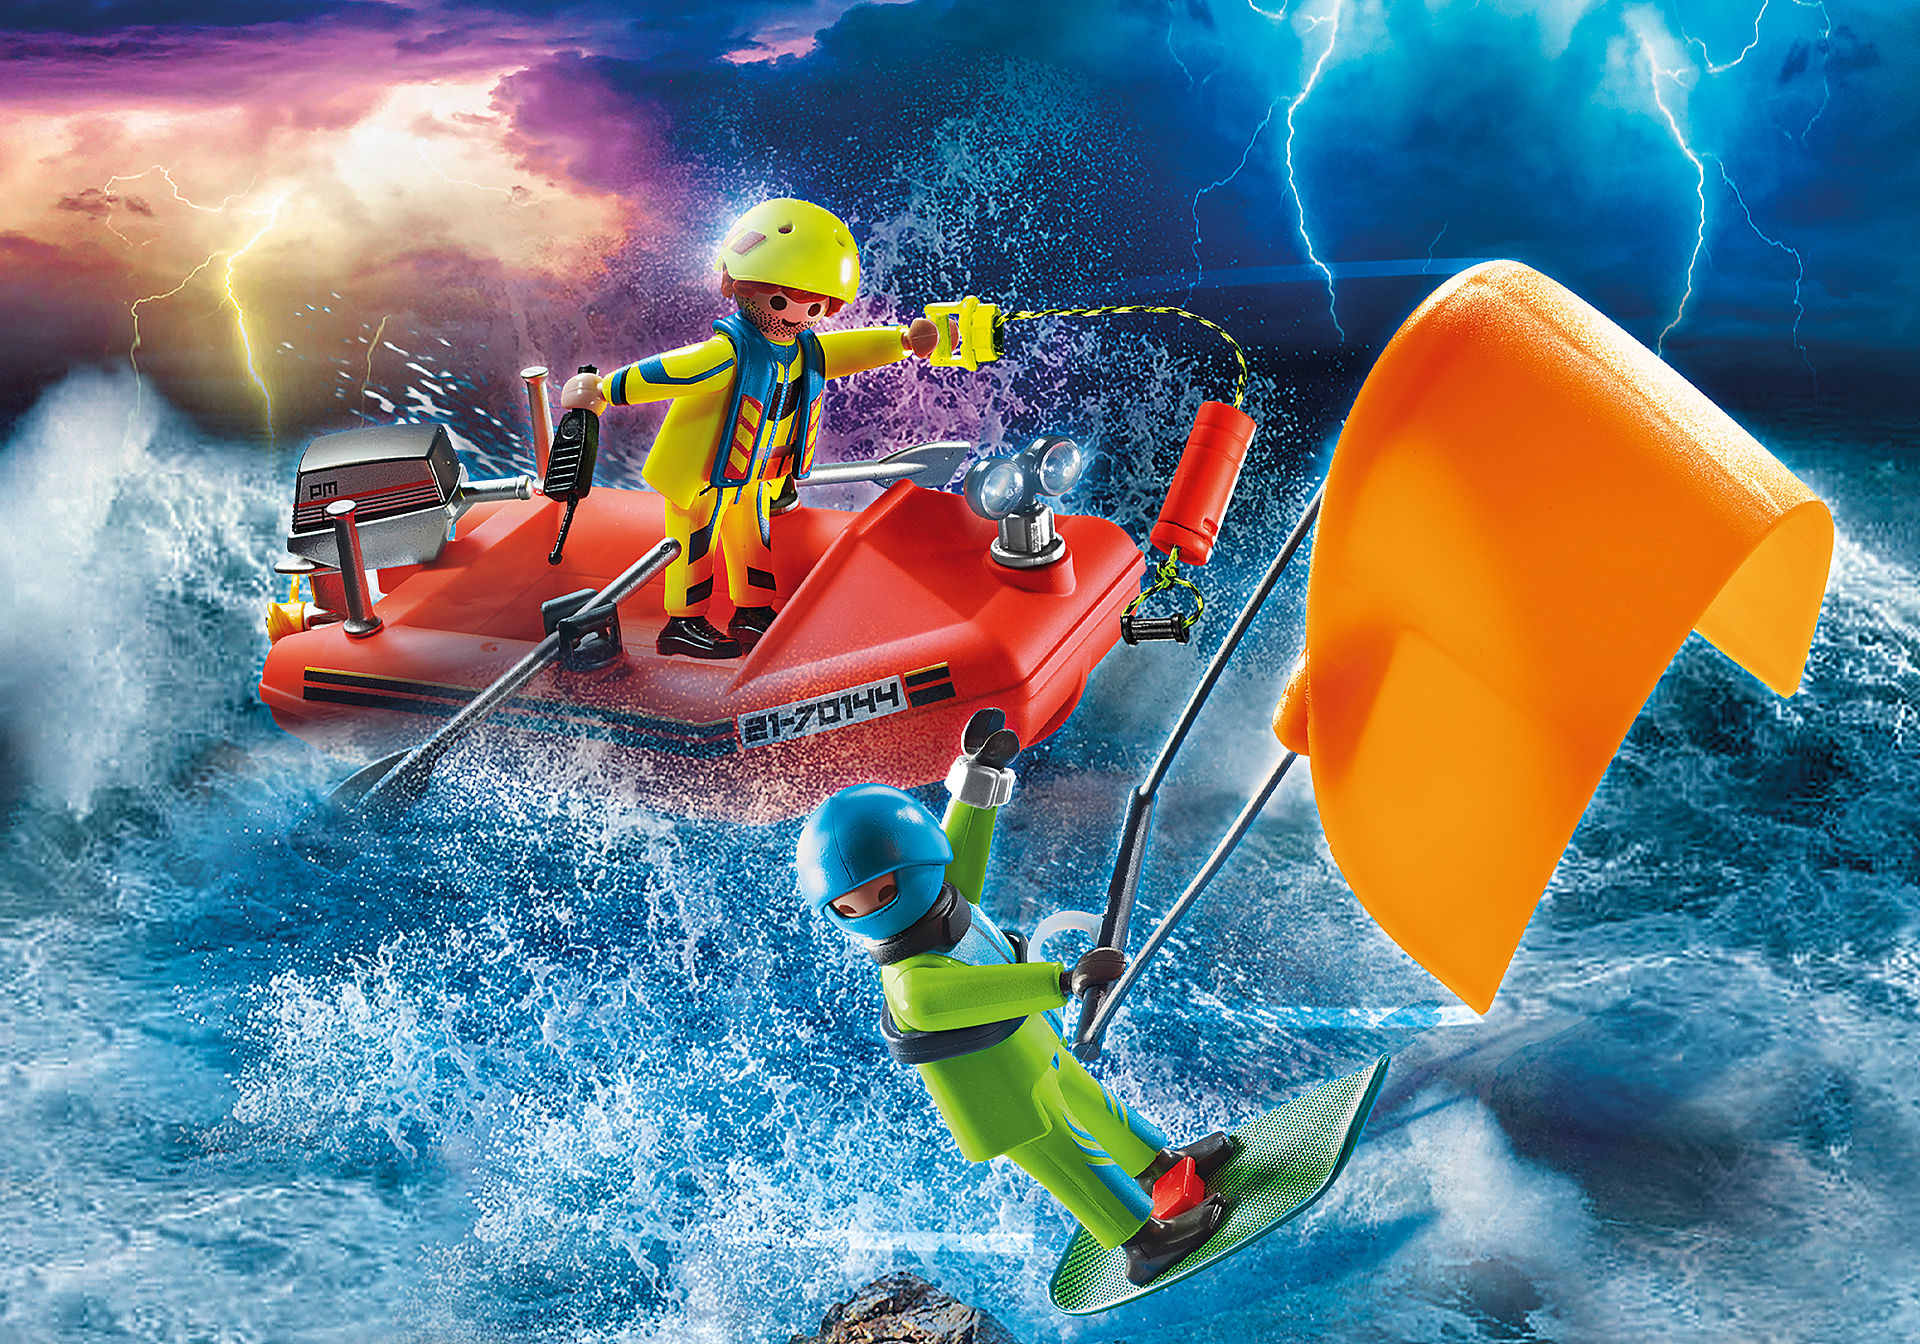 70144 Kitesurfer Rescue with Speedboat zoom image1